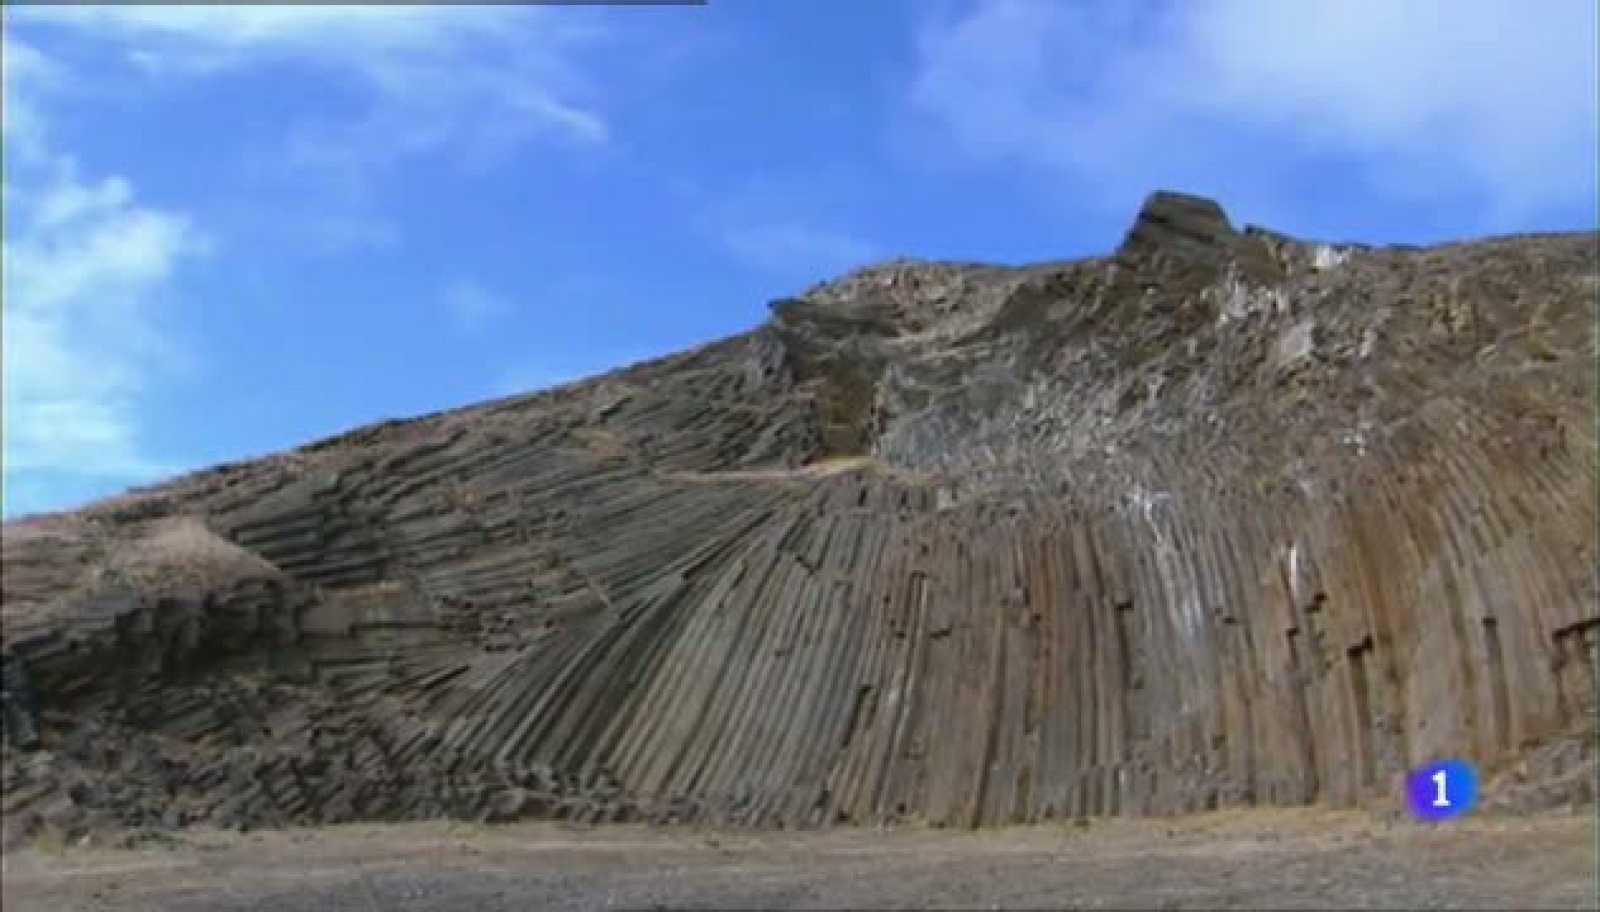 Aulaga - Pico Branco - Terra Cha